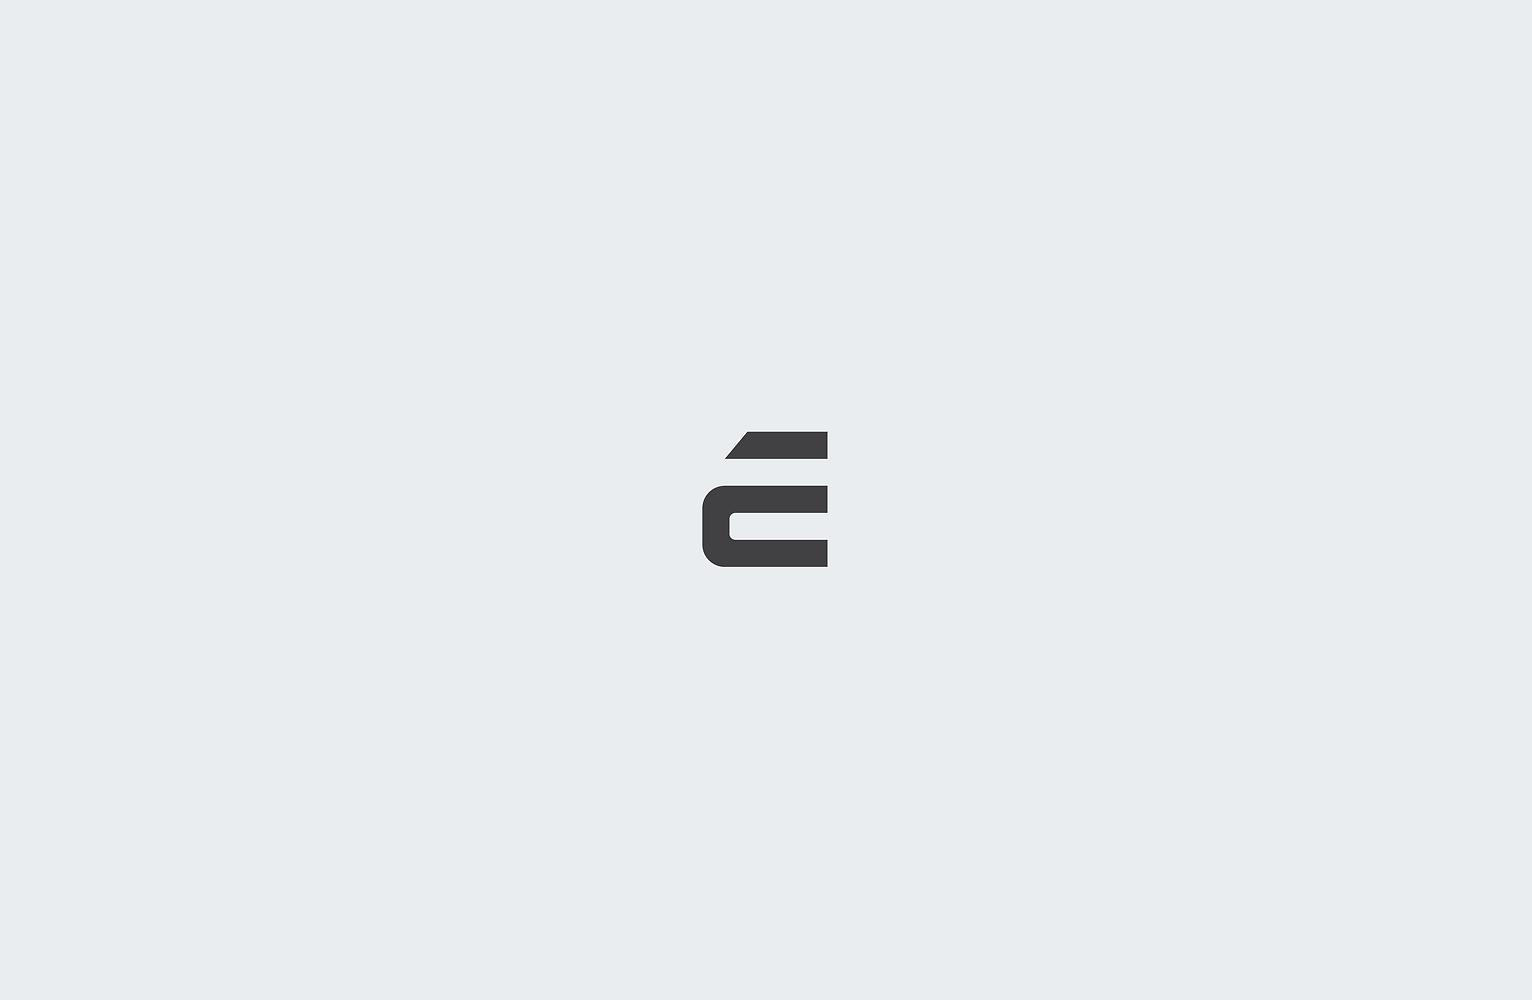 E_mark.png